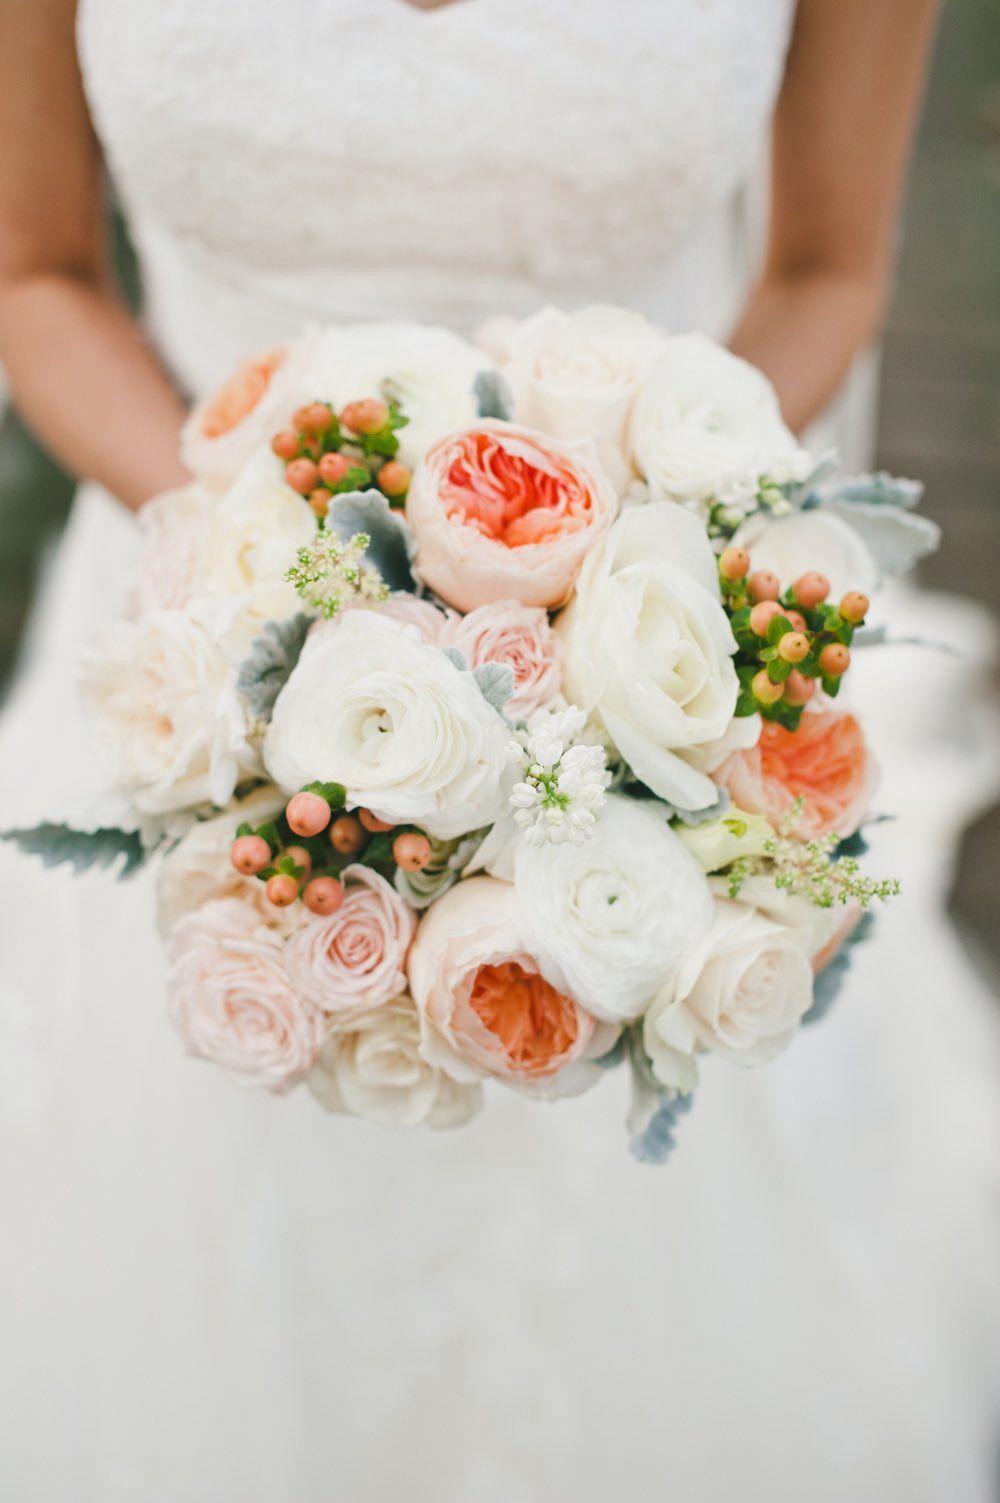 Fun Carnival Themed Malibu Wedding | Weddings, Carnival wedding and ...